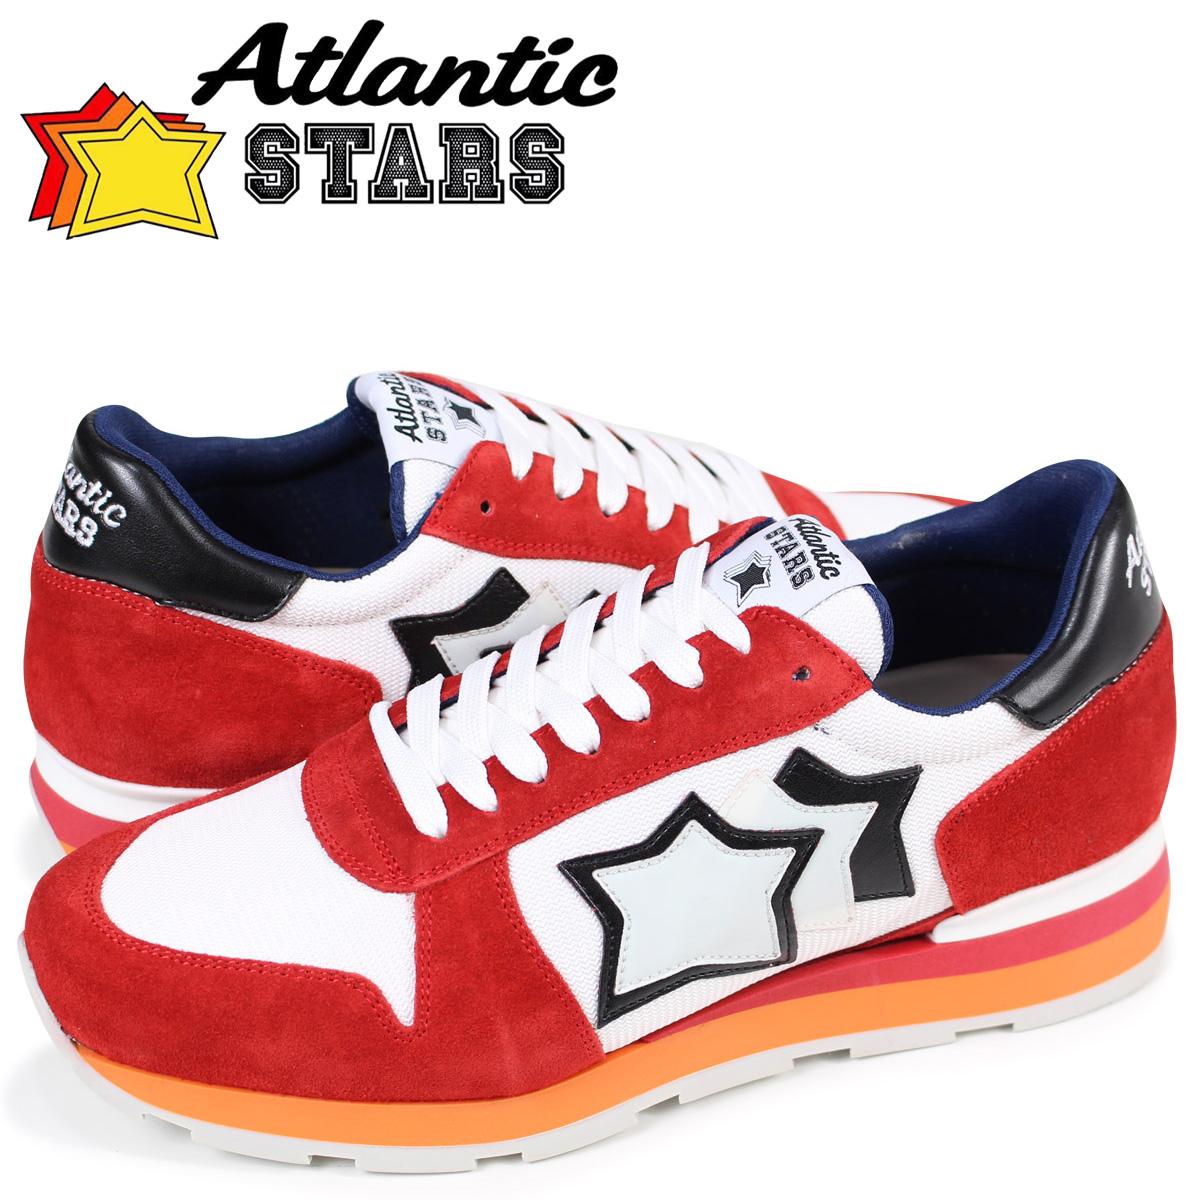 Atlantic STARS メンズ スニーカー アトランティックスターズシリウス SIRIUS RB-85B ホワイト